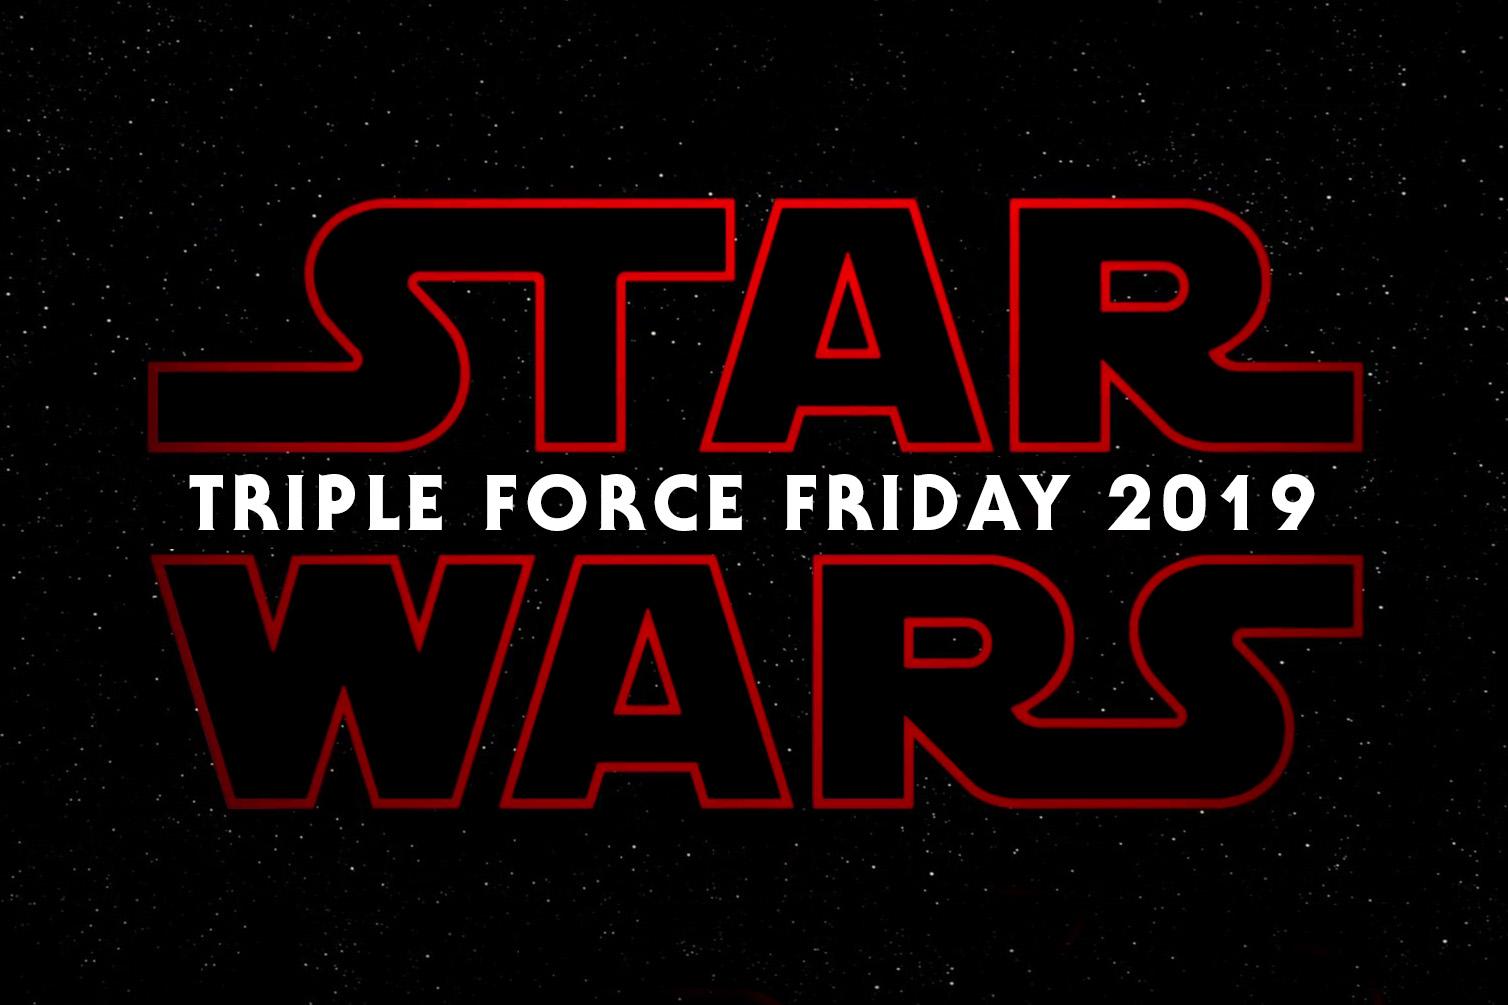 Triple Force Friday 2019 - The Kessel Runway